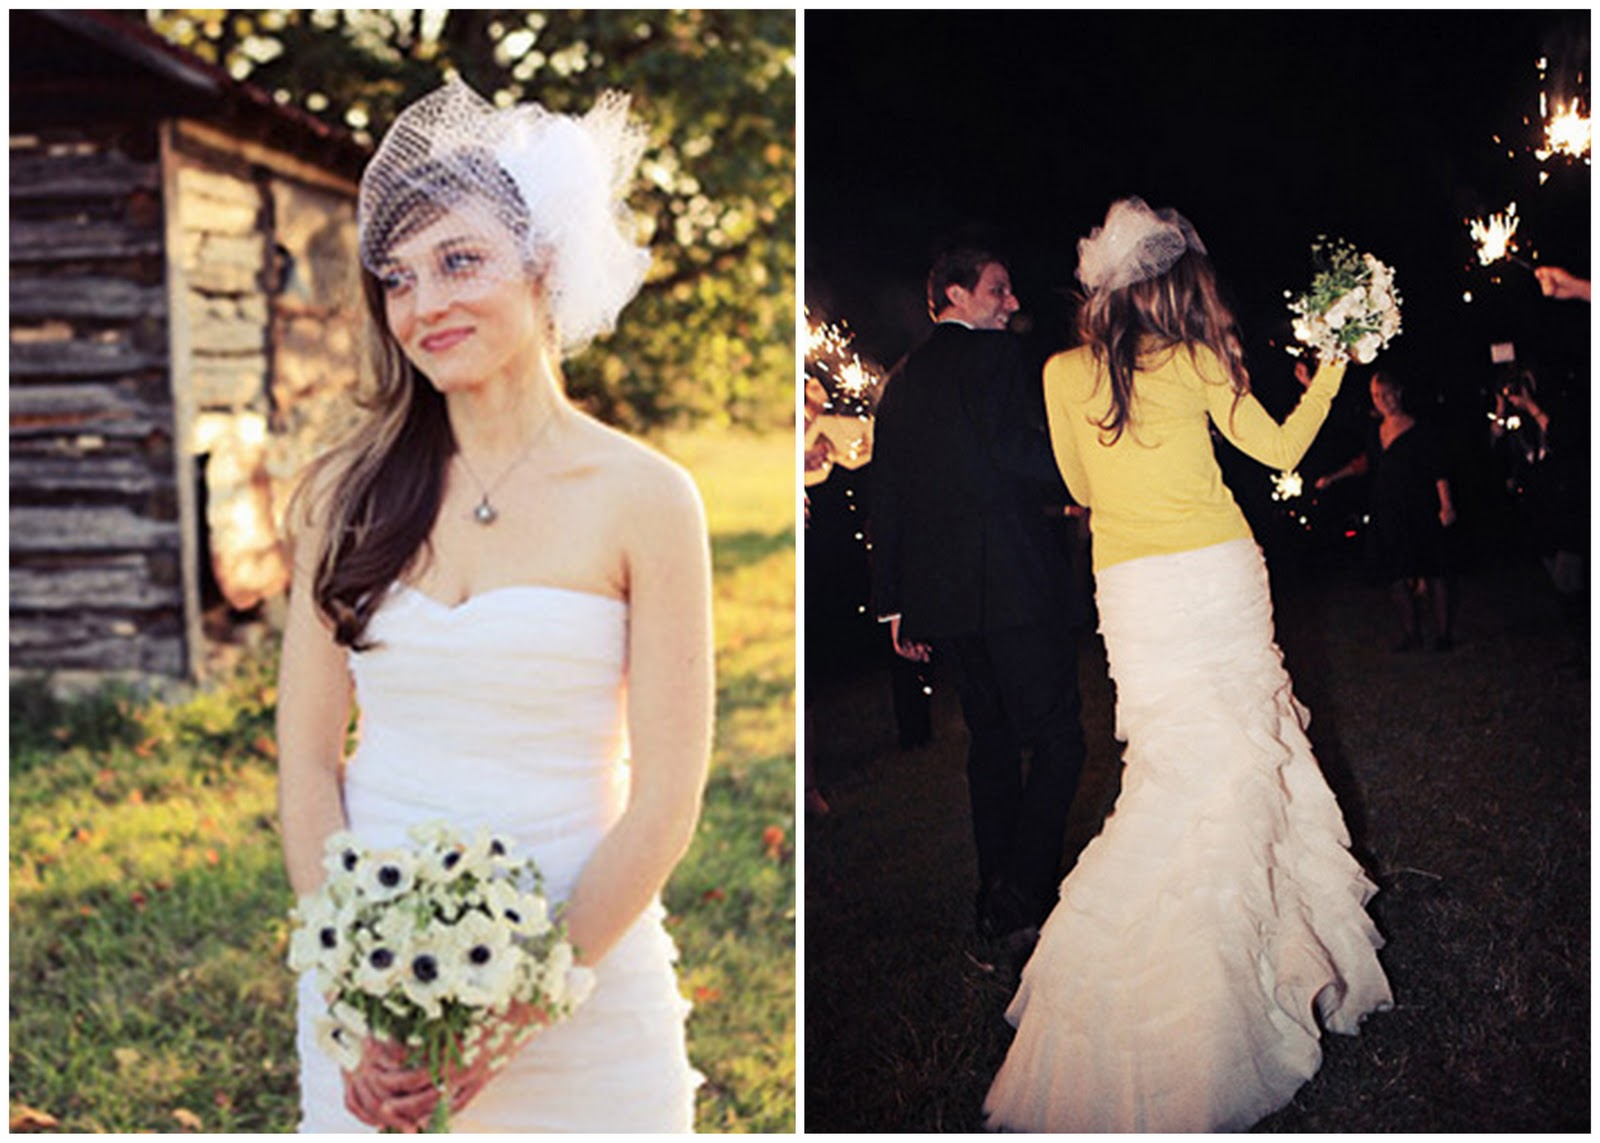 LovelyGirls Weddings Events Dresses Cardigans = Toastie